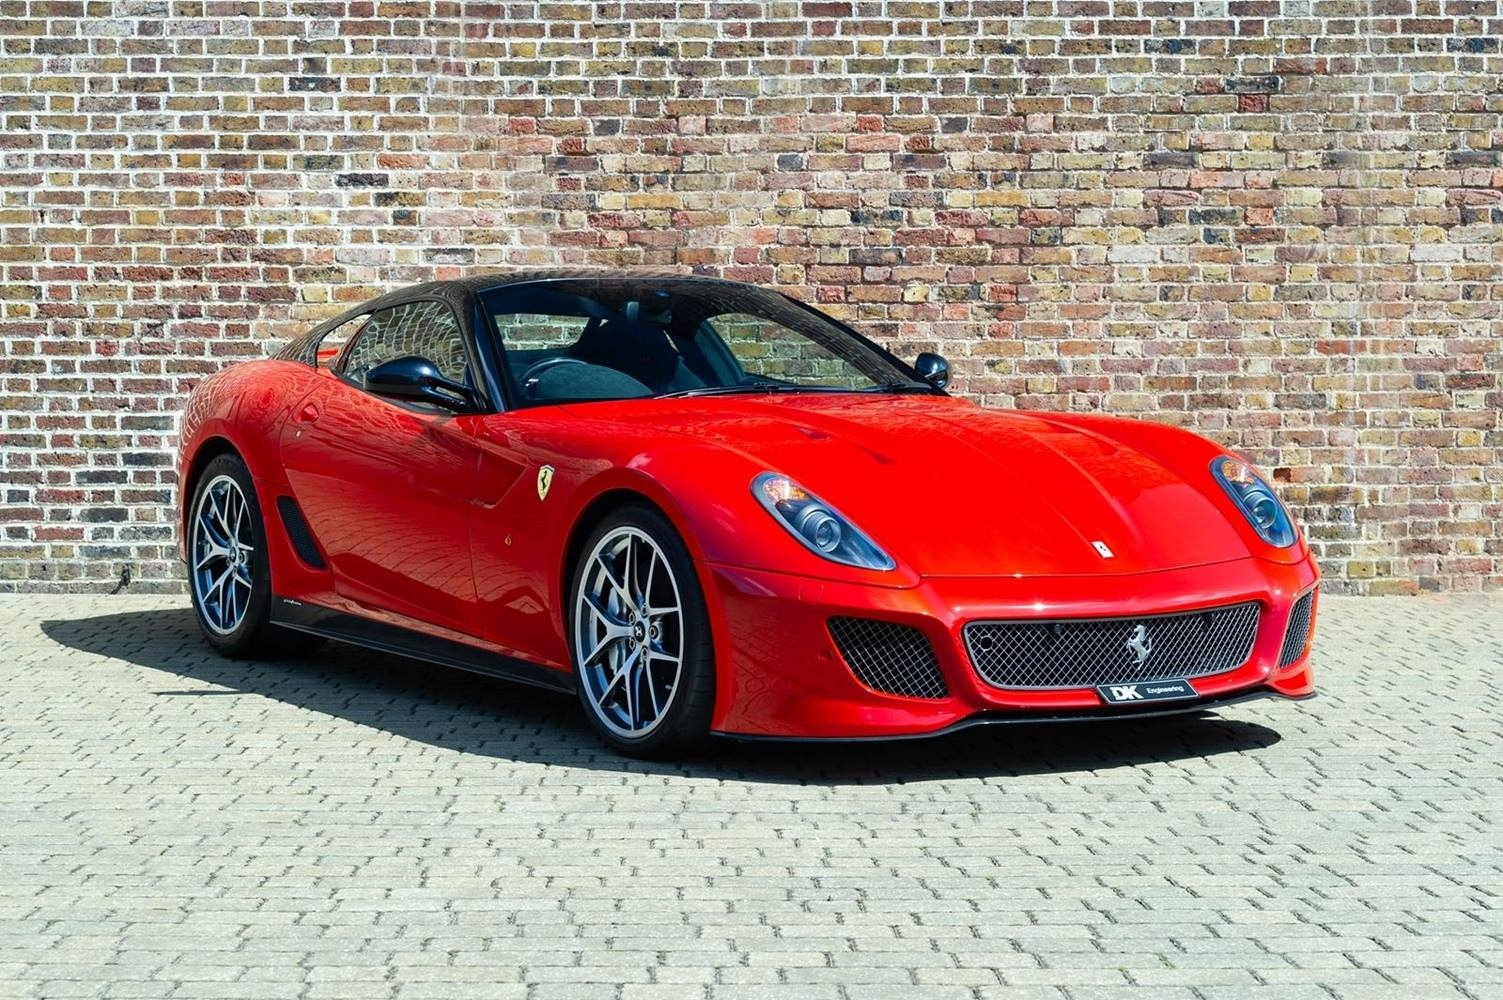 Ferrari 599 Gto For Sale Vehicle Sales Dk Engineering